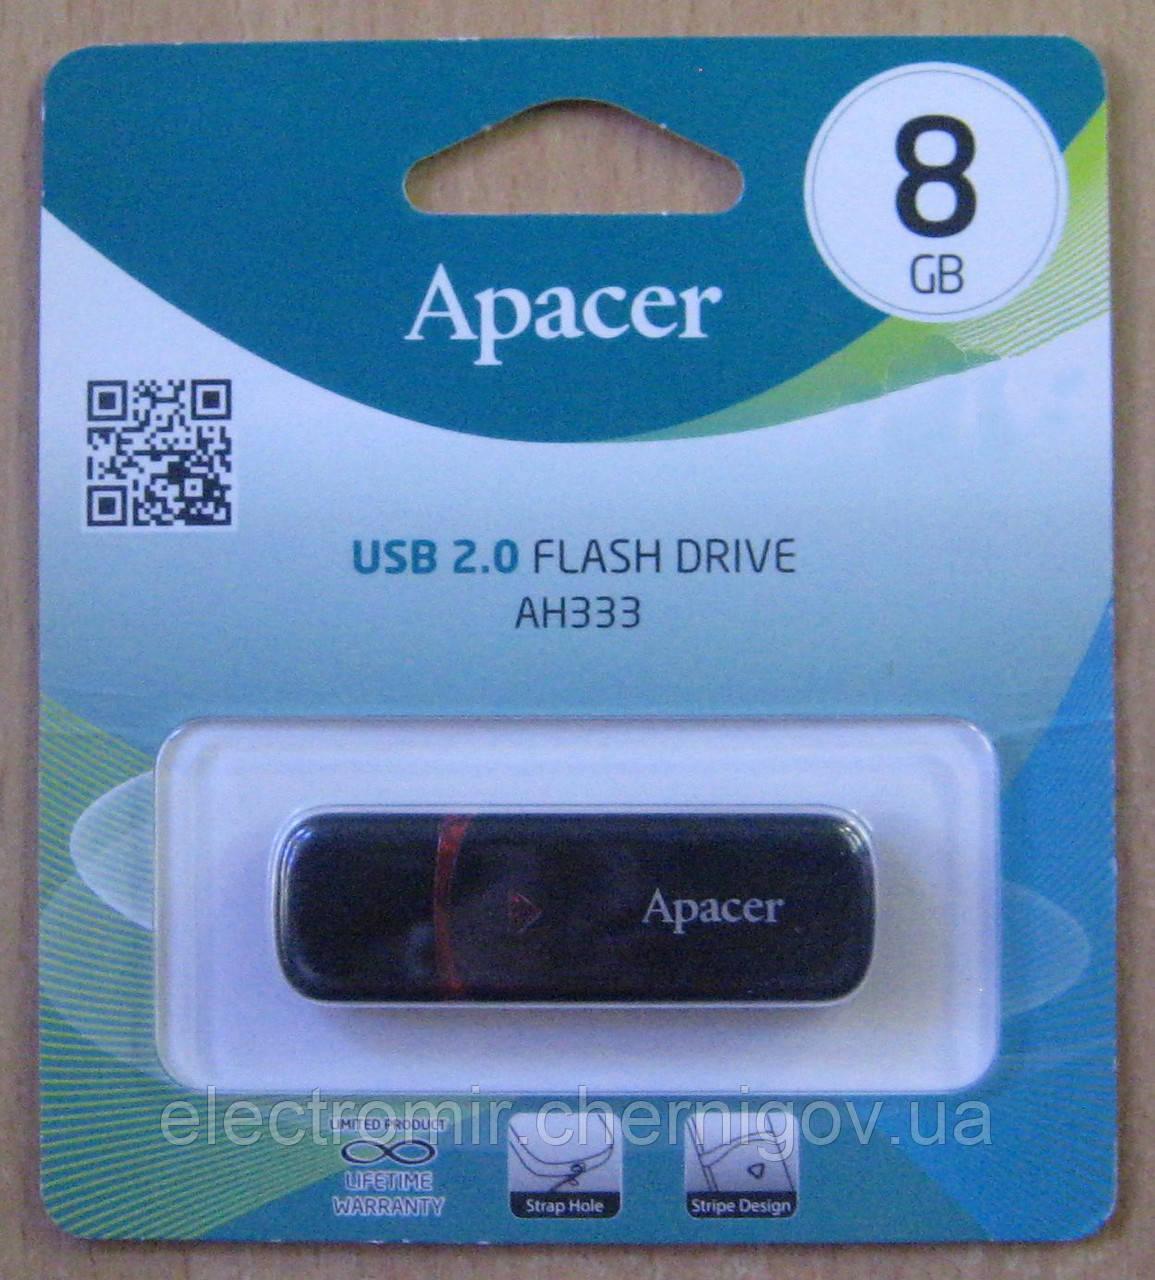 Флешка Apacer 8 GB AH333 (чёрная)